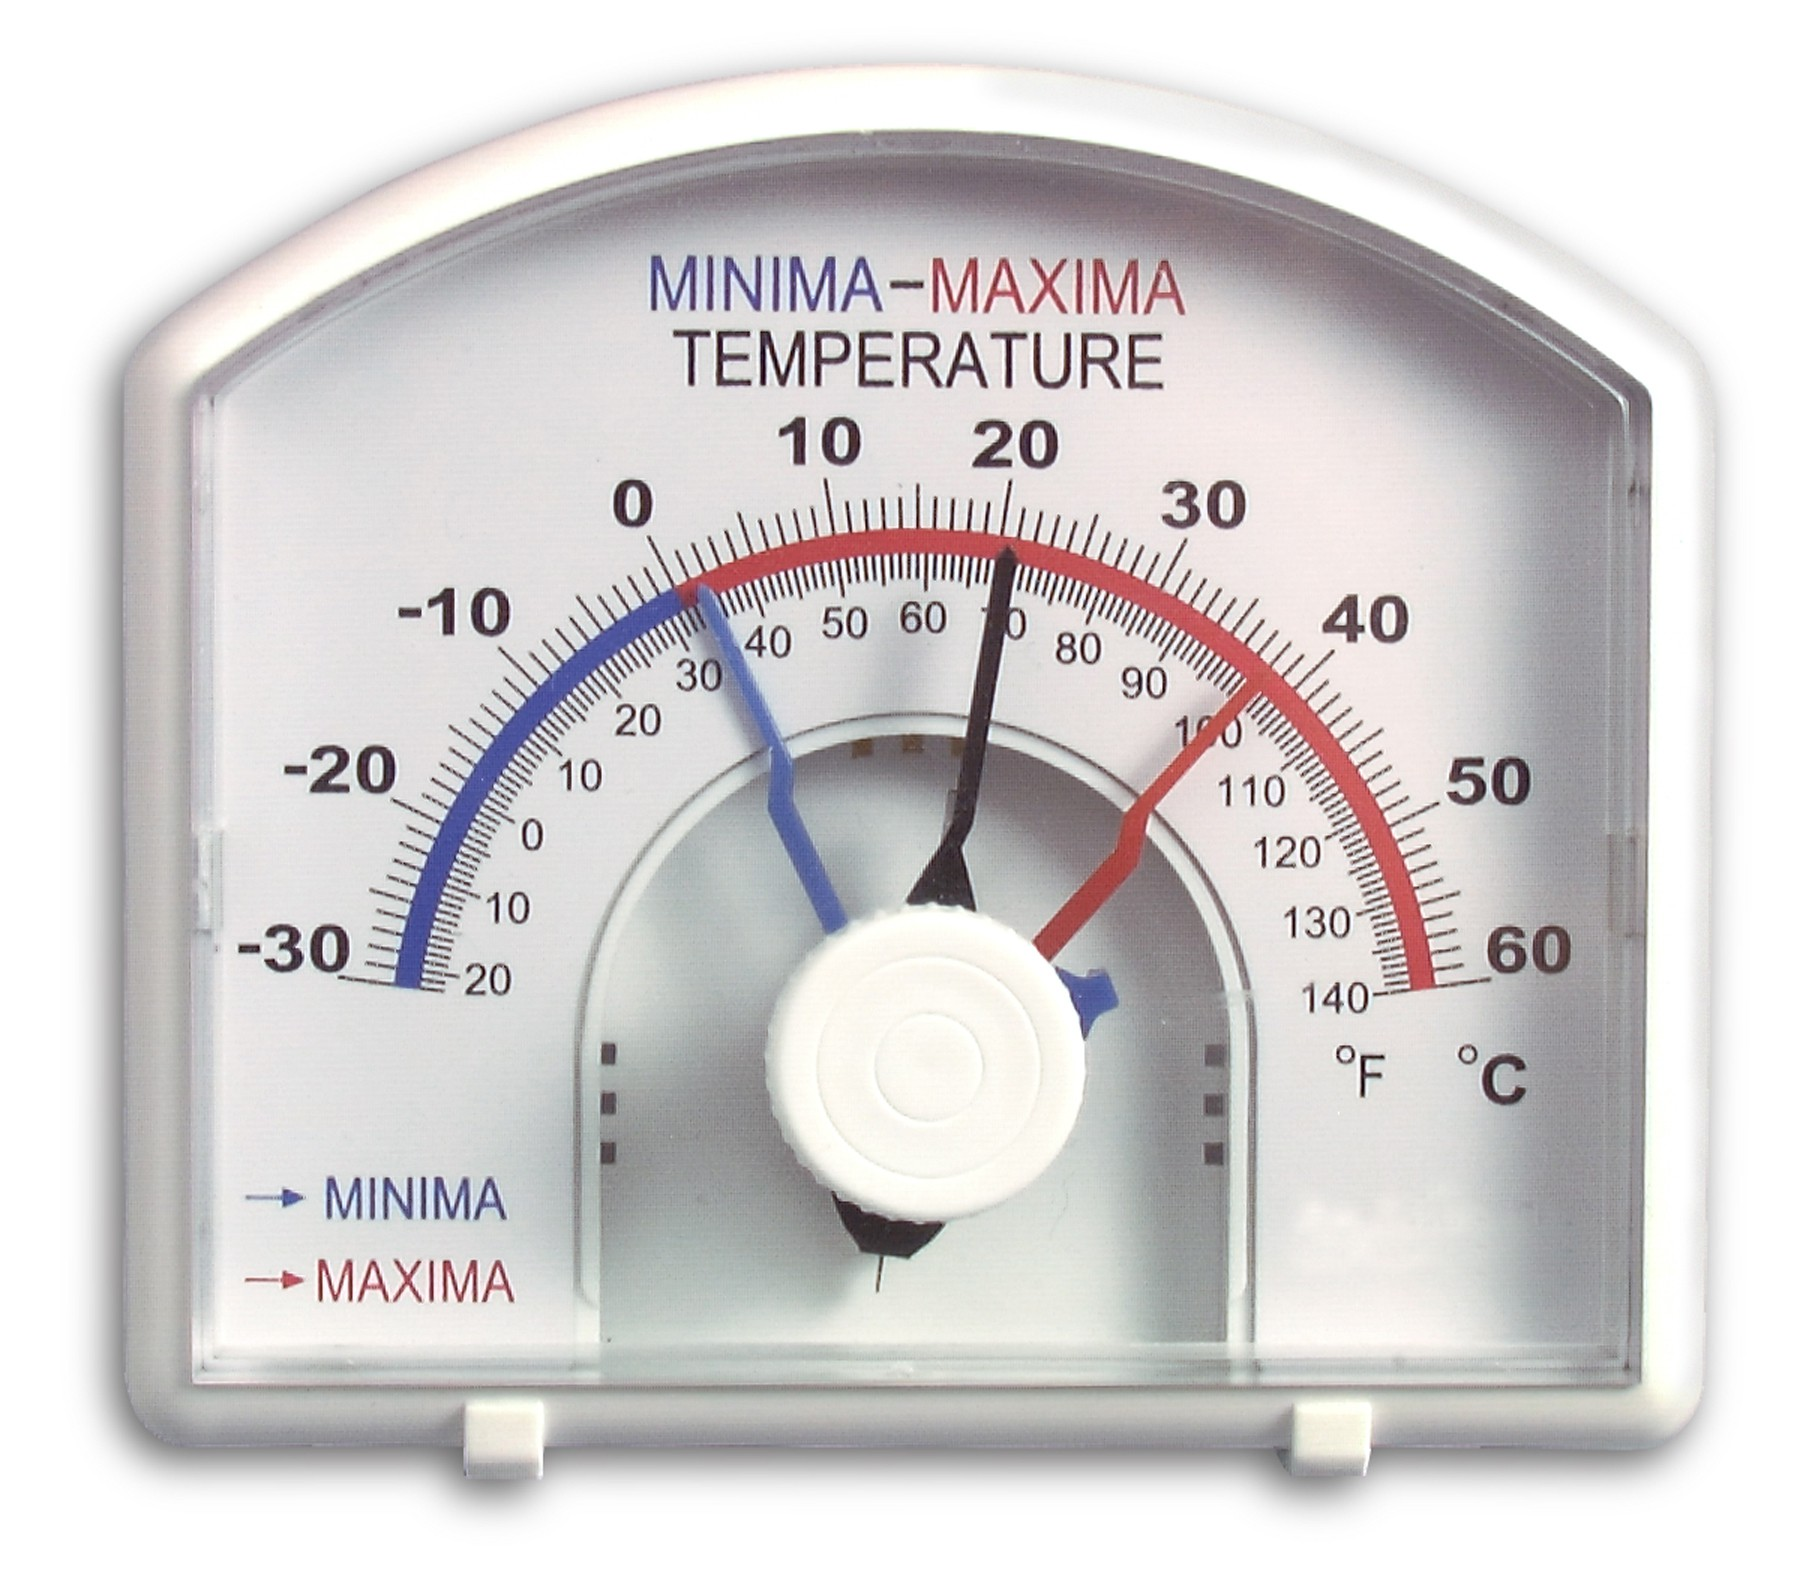 h b durac bi metallic min max thermometer default store view. Black Bedroom Furniture Sets. Home Design Ideas